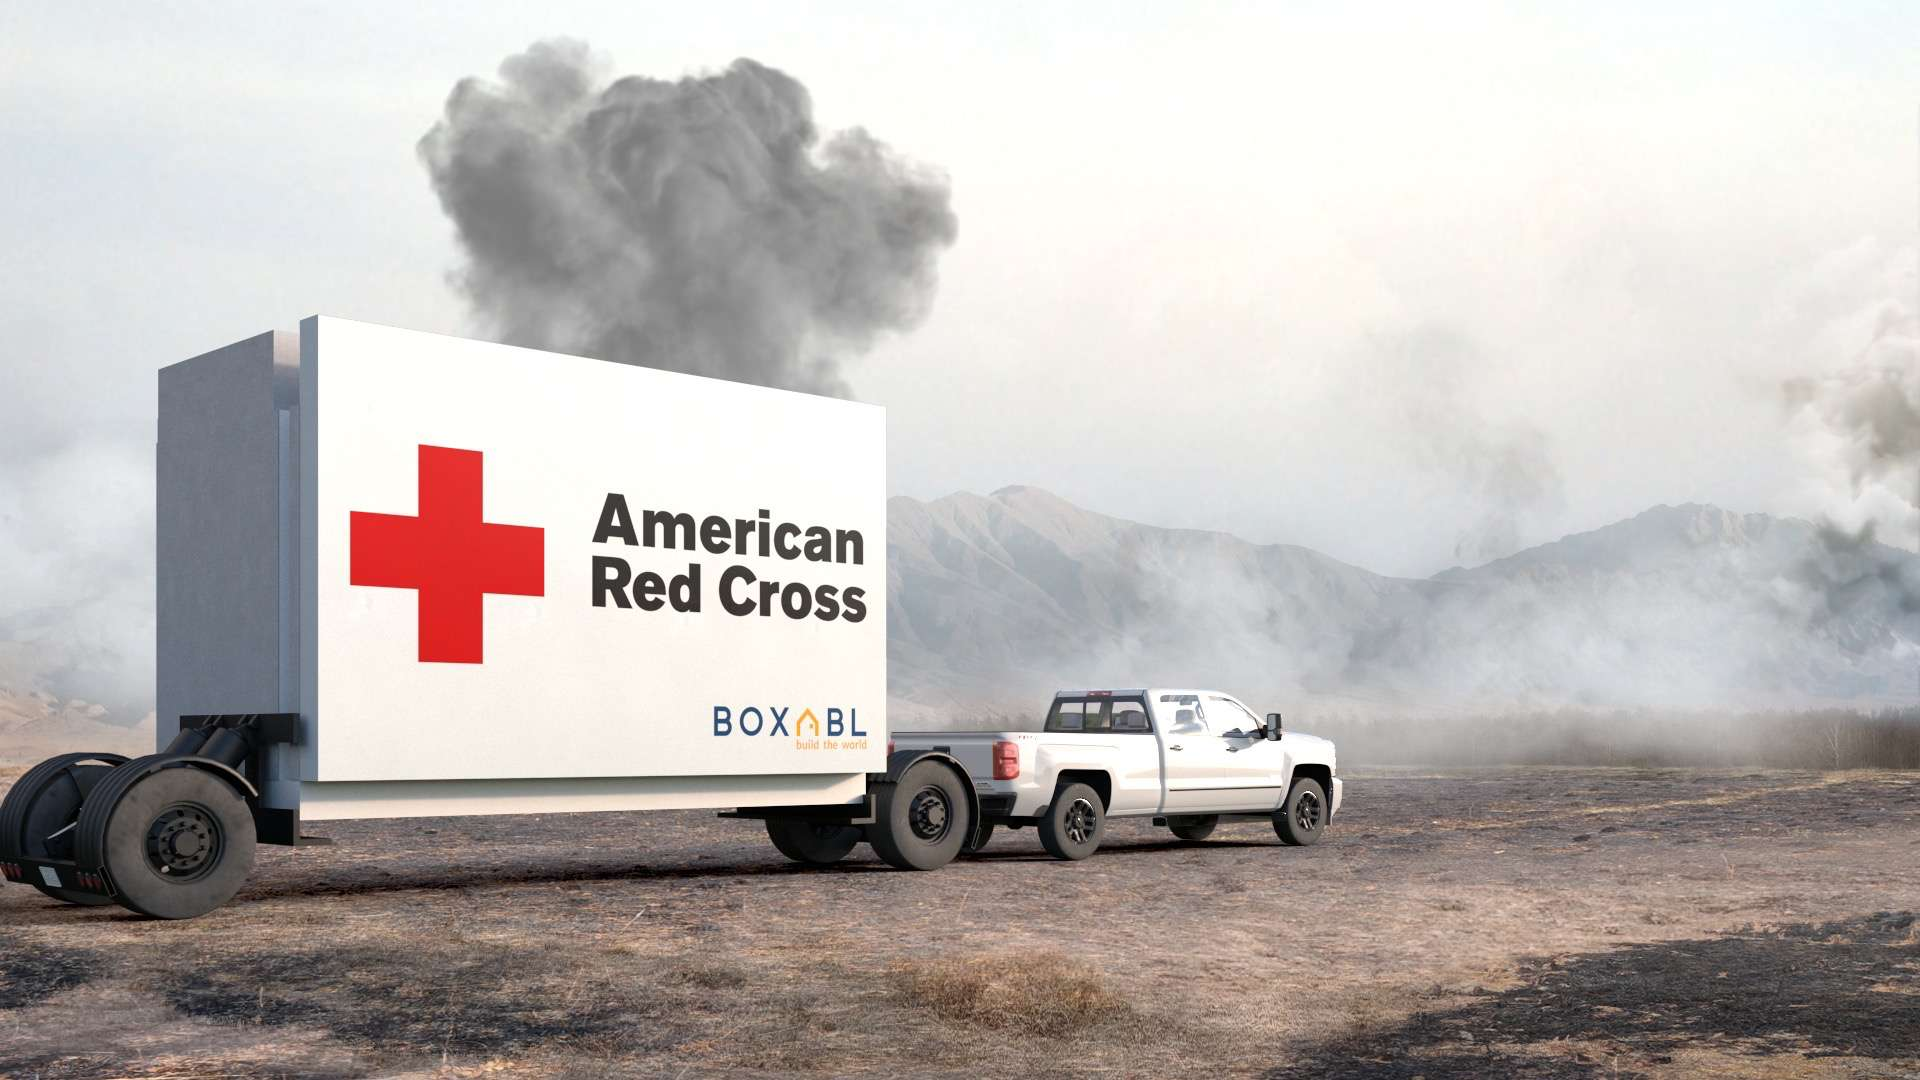 Red Cross deployment